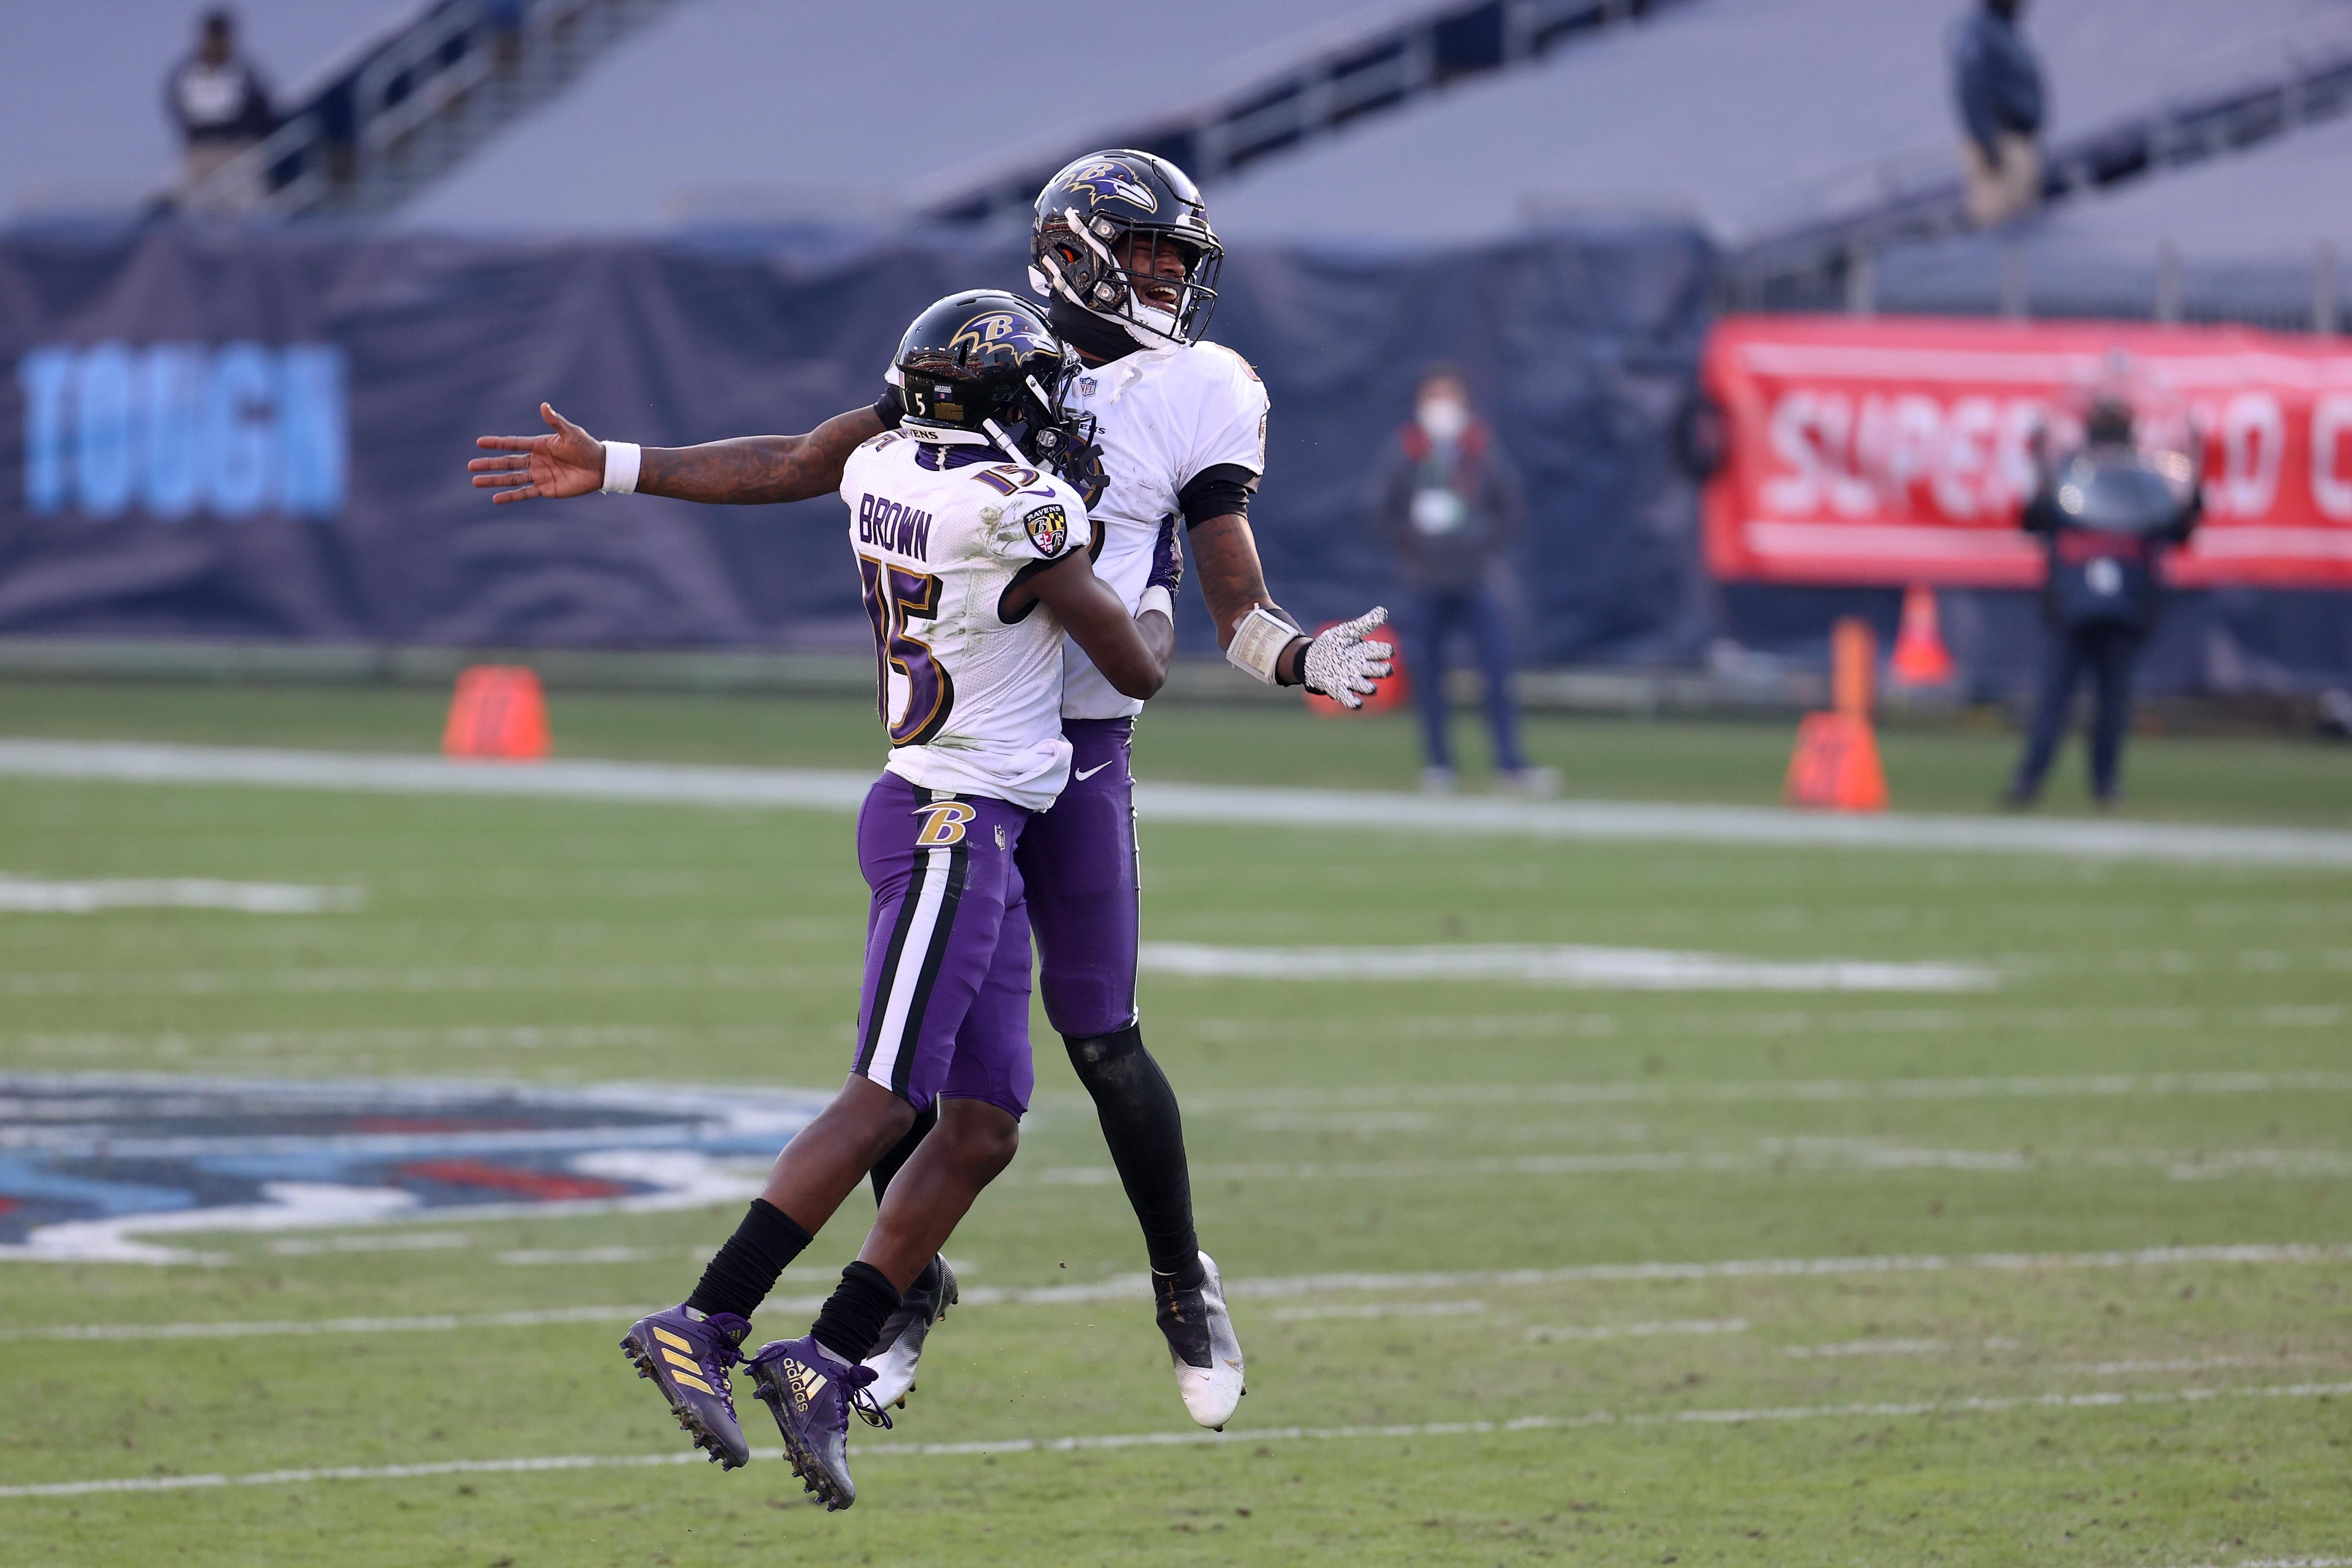 NFL - Baltimore Ravens v Tennessee Titans, Lamar Jackson